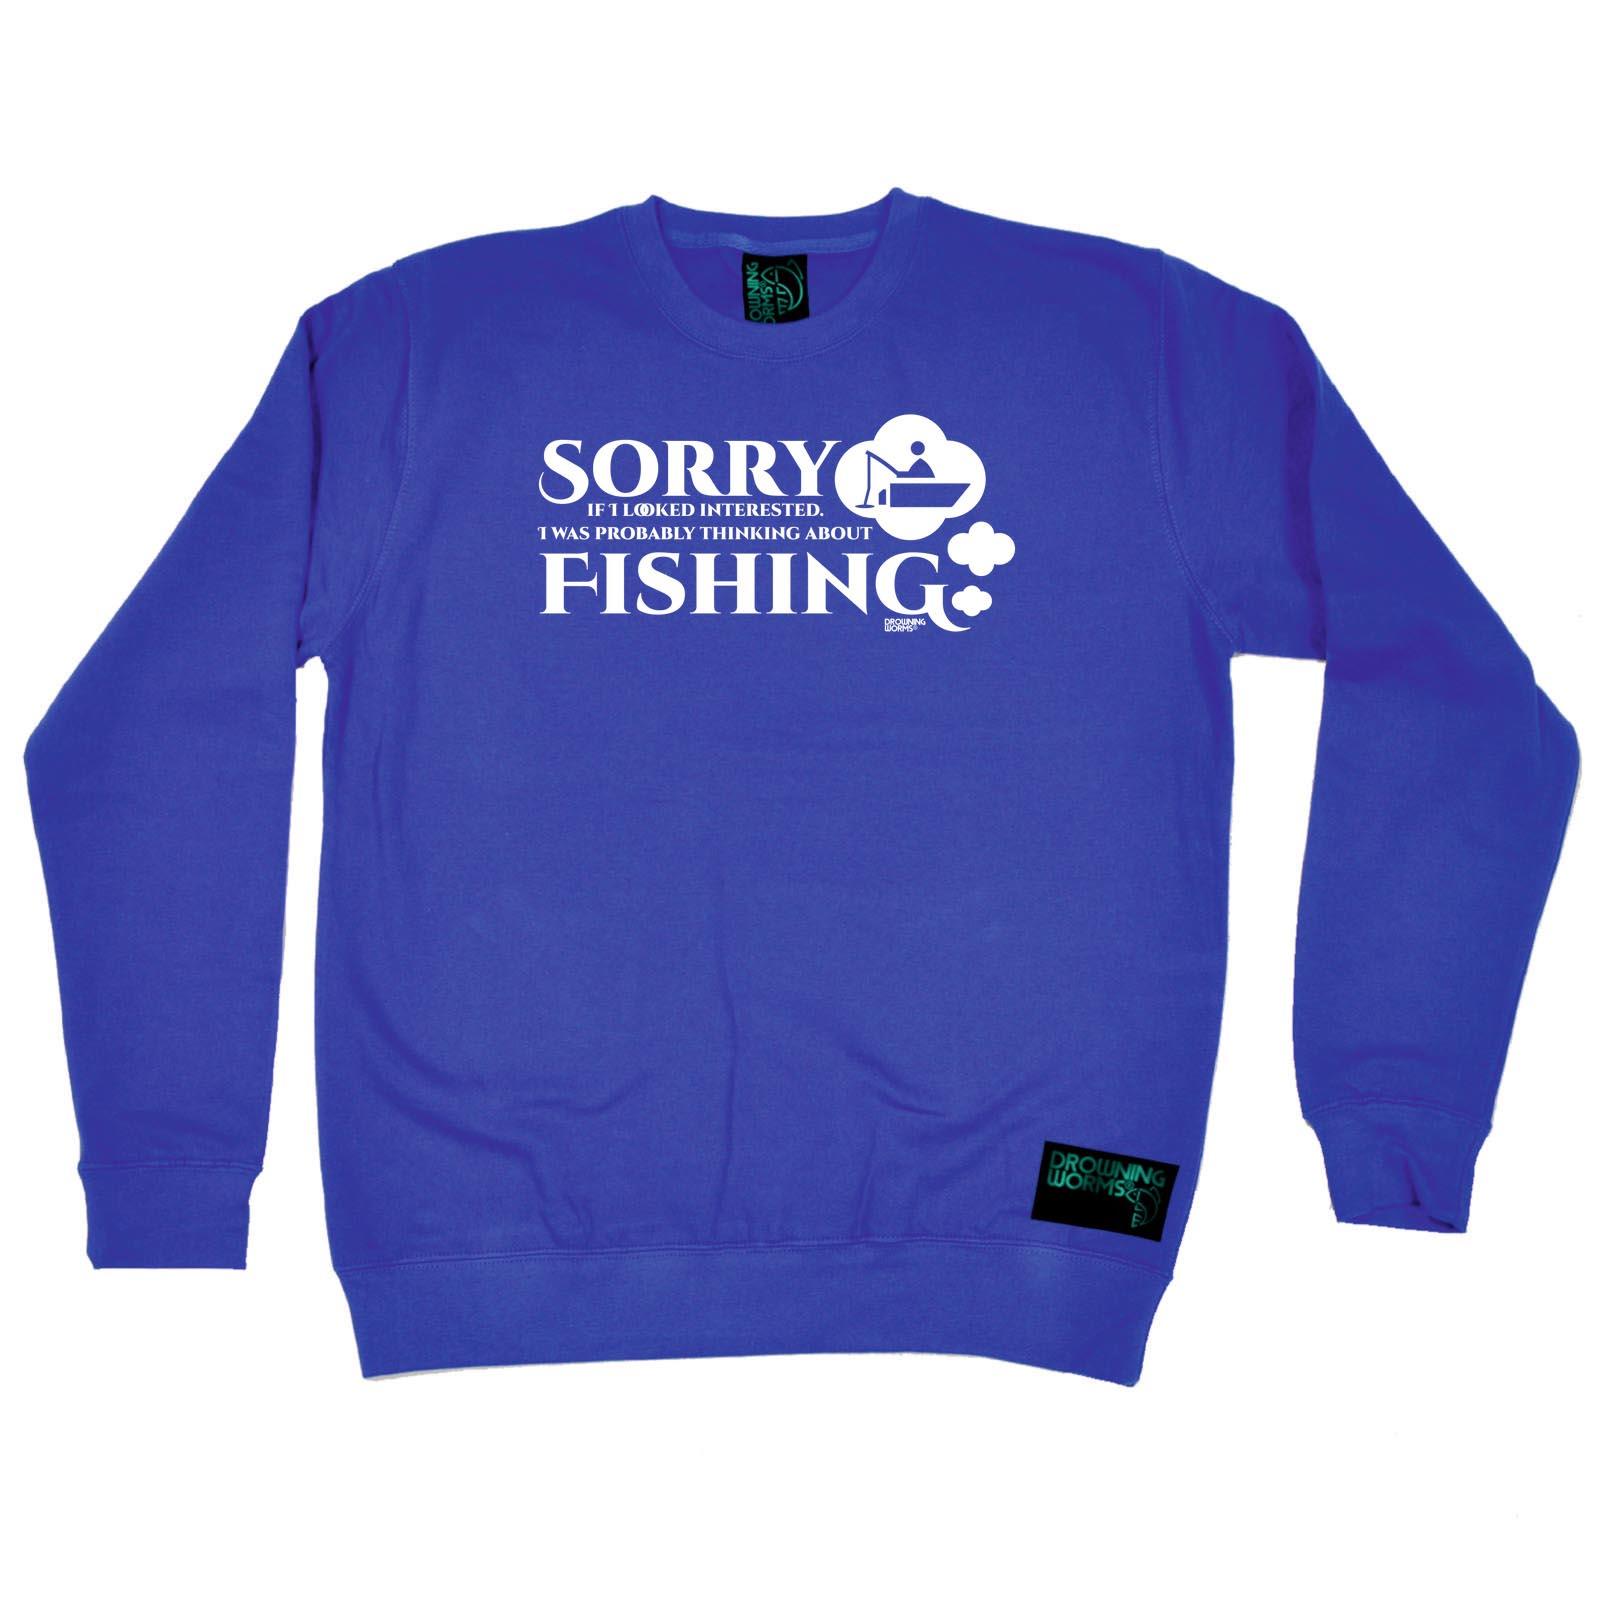 Sorry If I Looked Interested Fishi Fishing Sweatshirt Funny Novelty Jumper Top